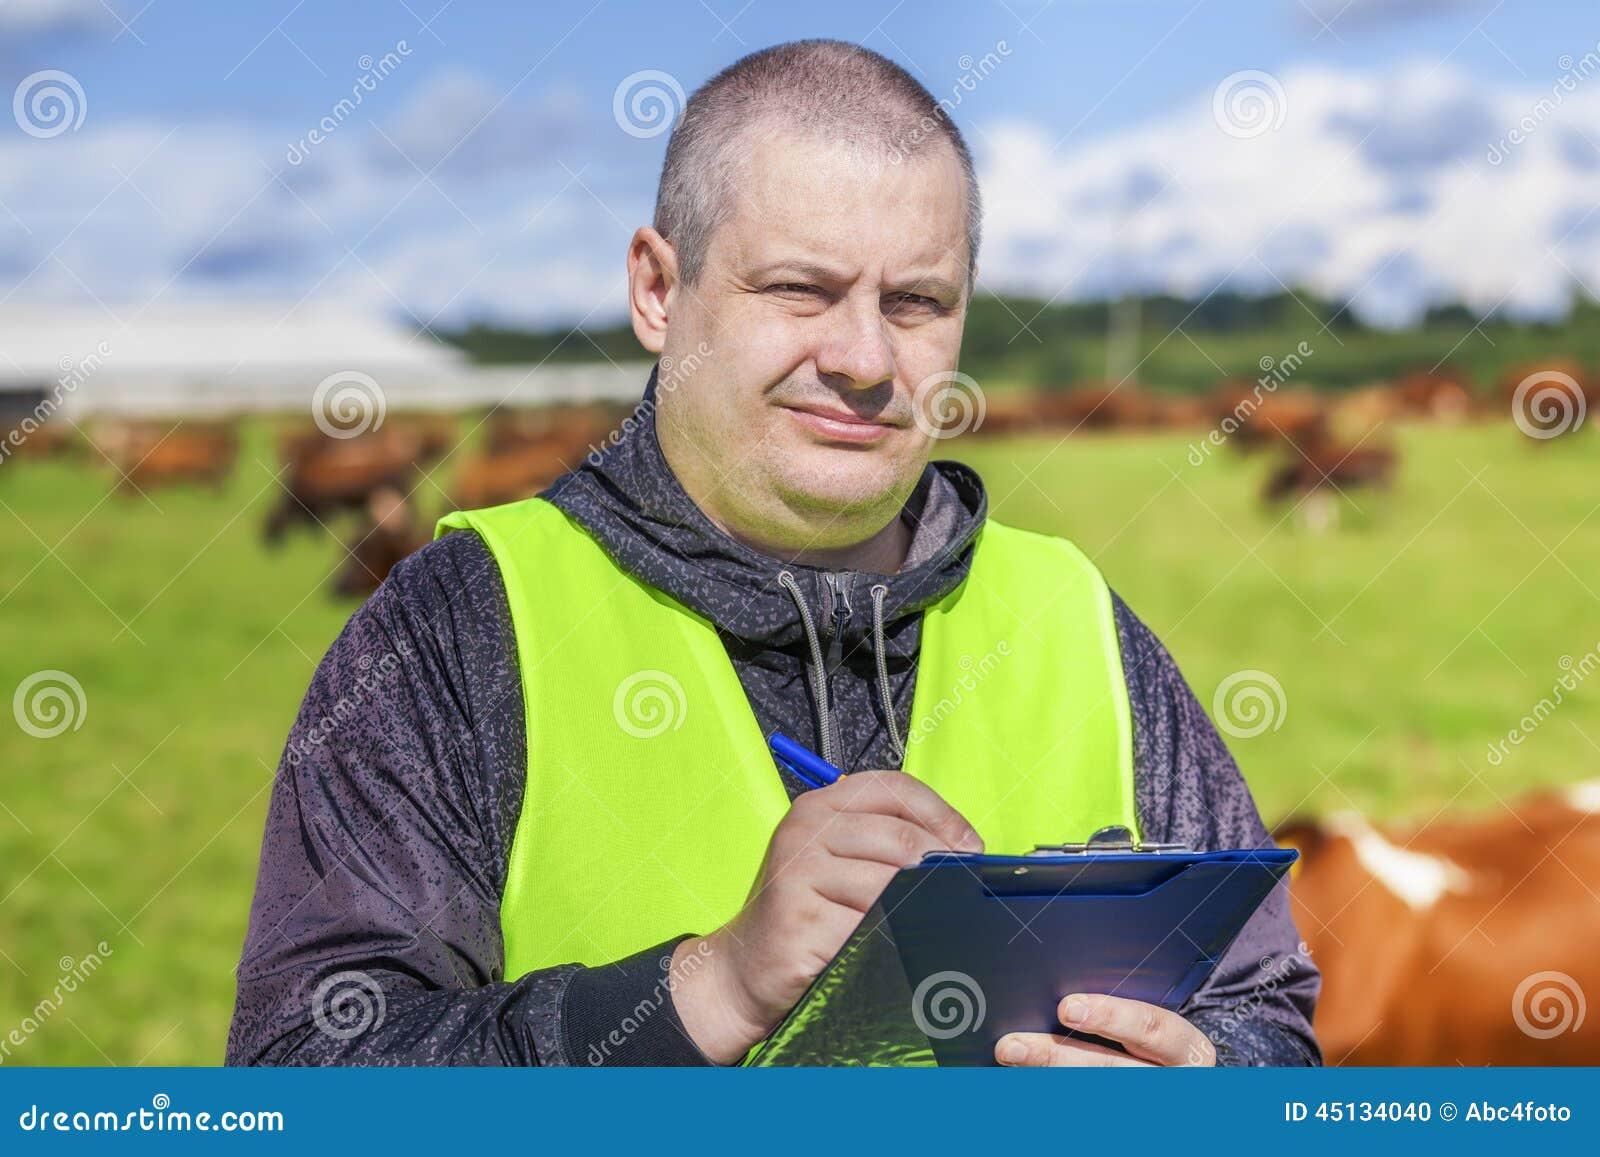 Landless farmers essay writer